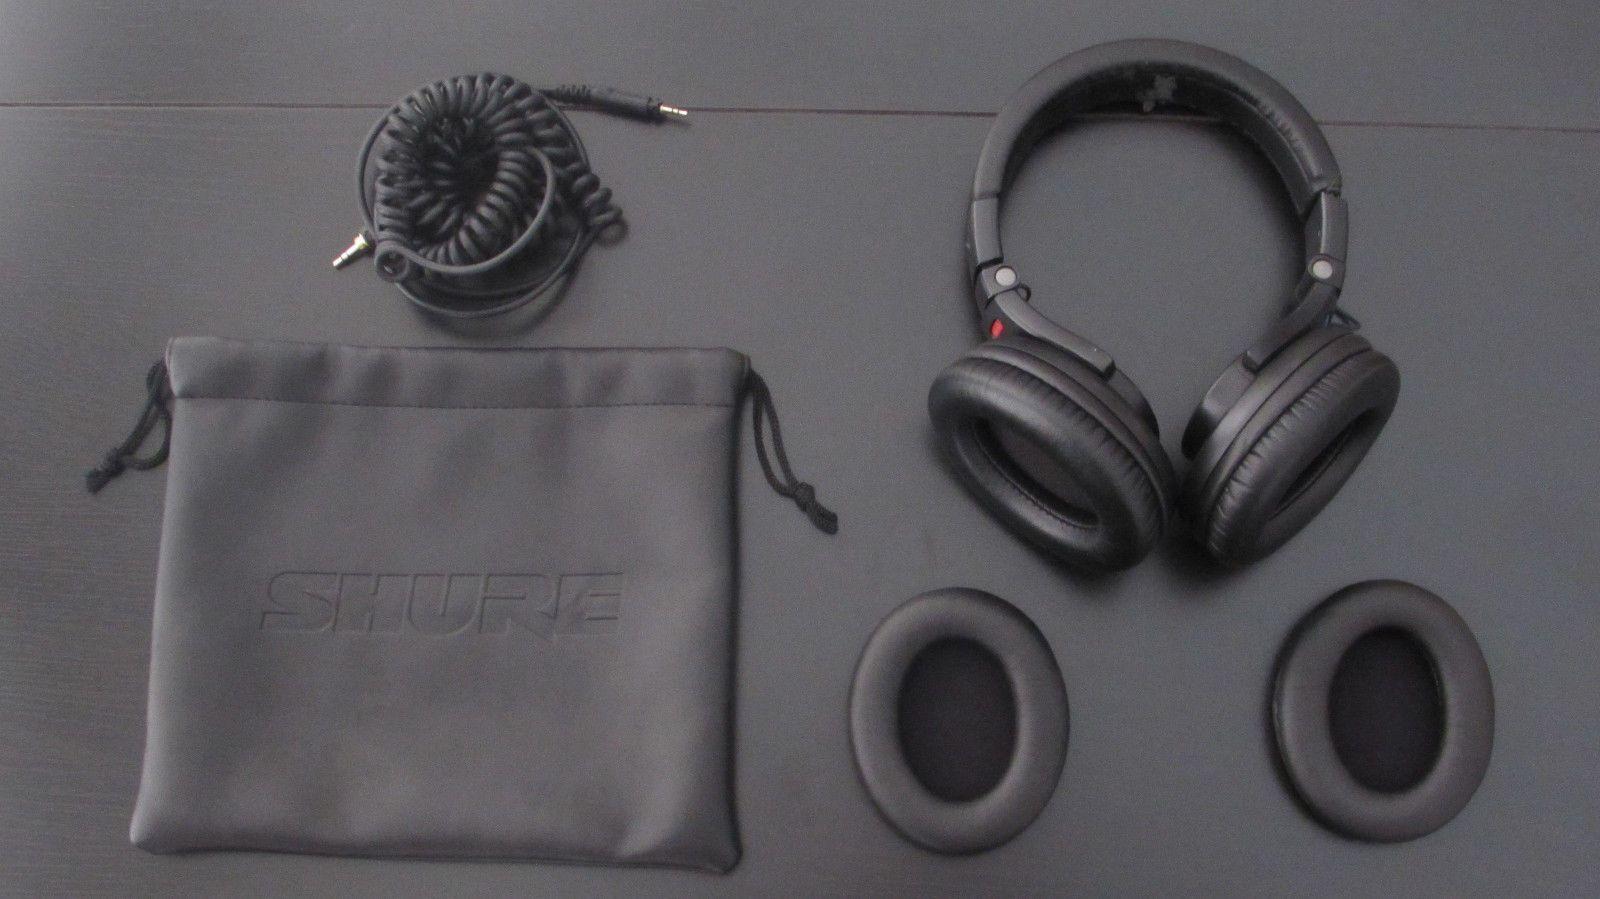 0aa80884701 Shure SRH440 Headband Headphones - Black | Music Is Life ...